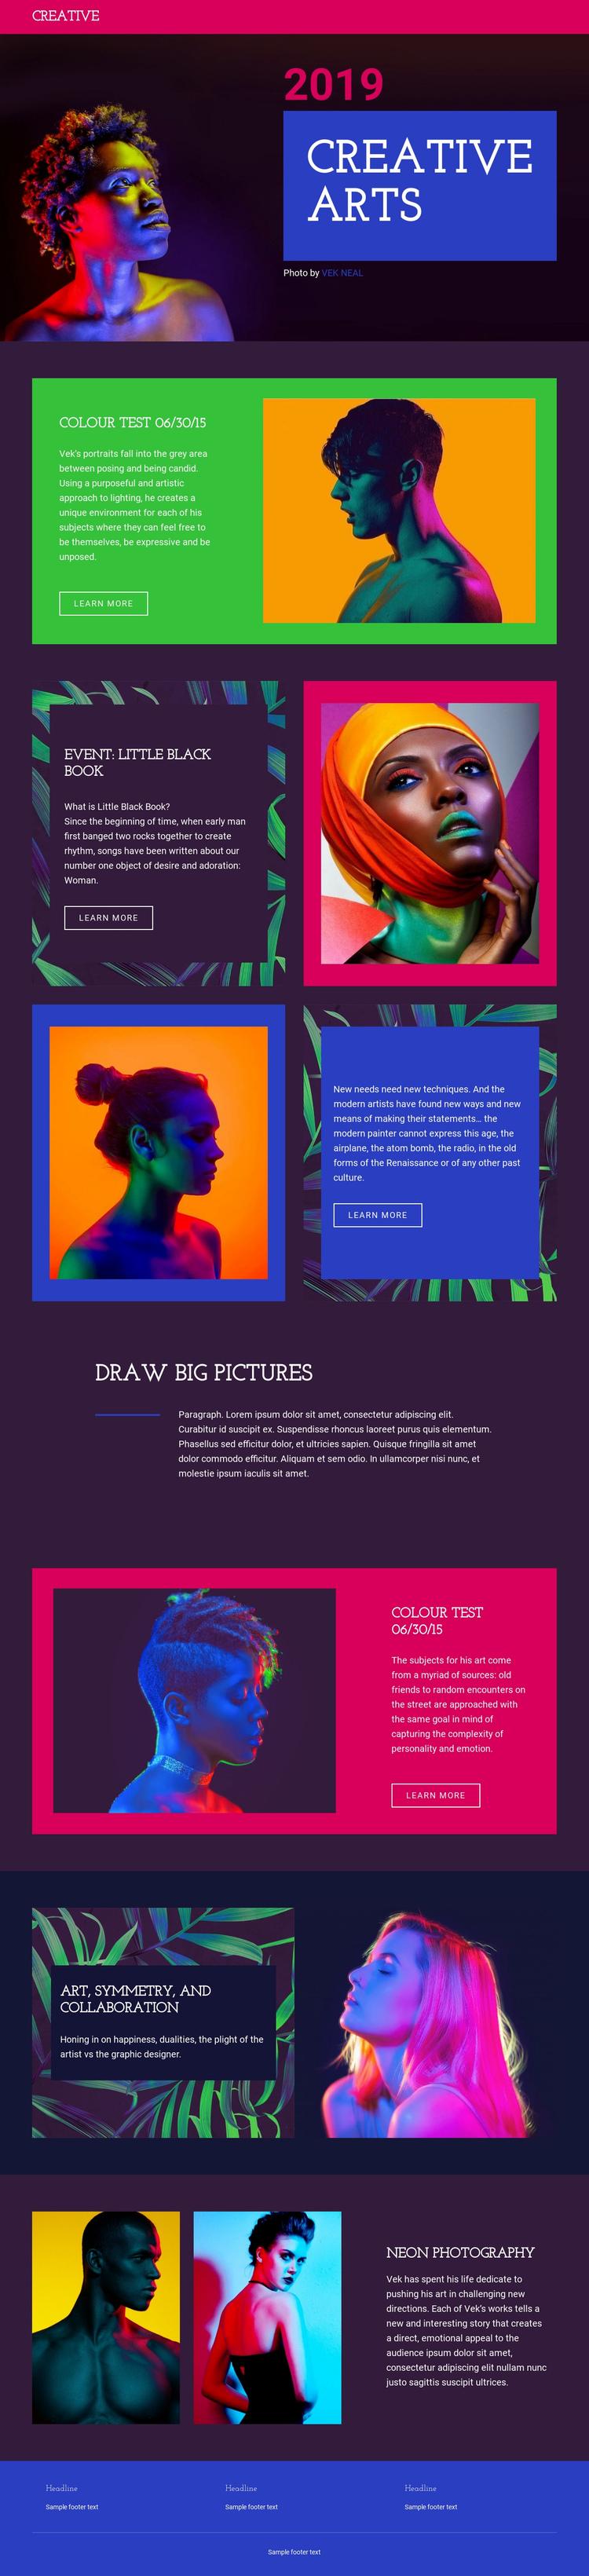 Creative Arts Website Builder Software